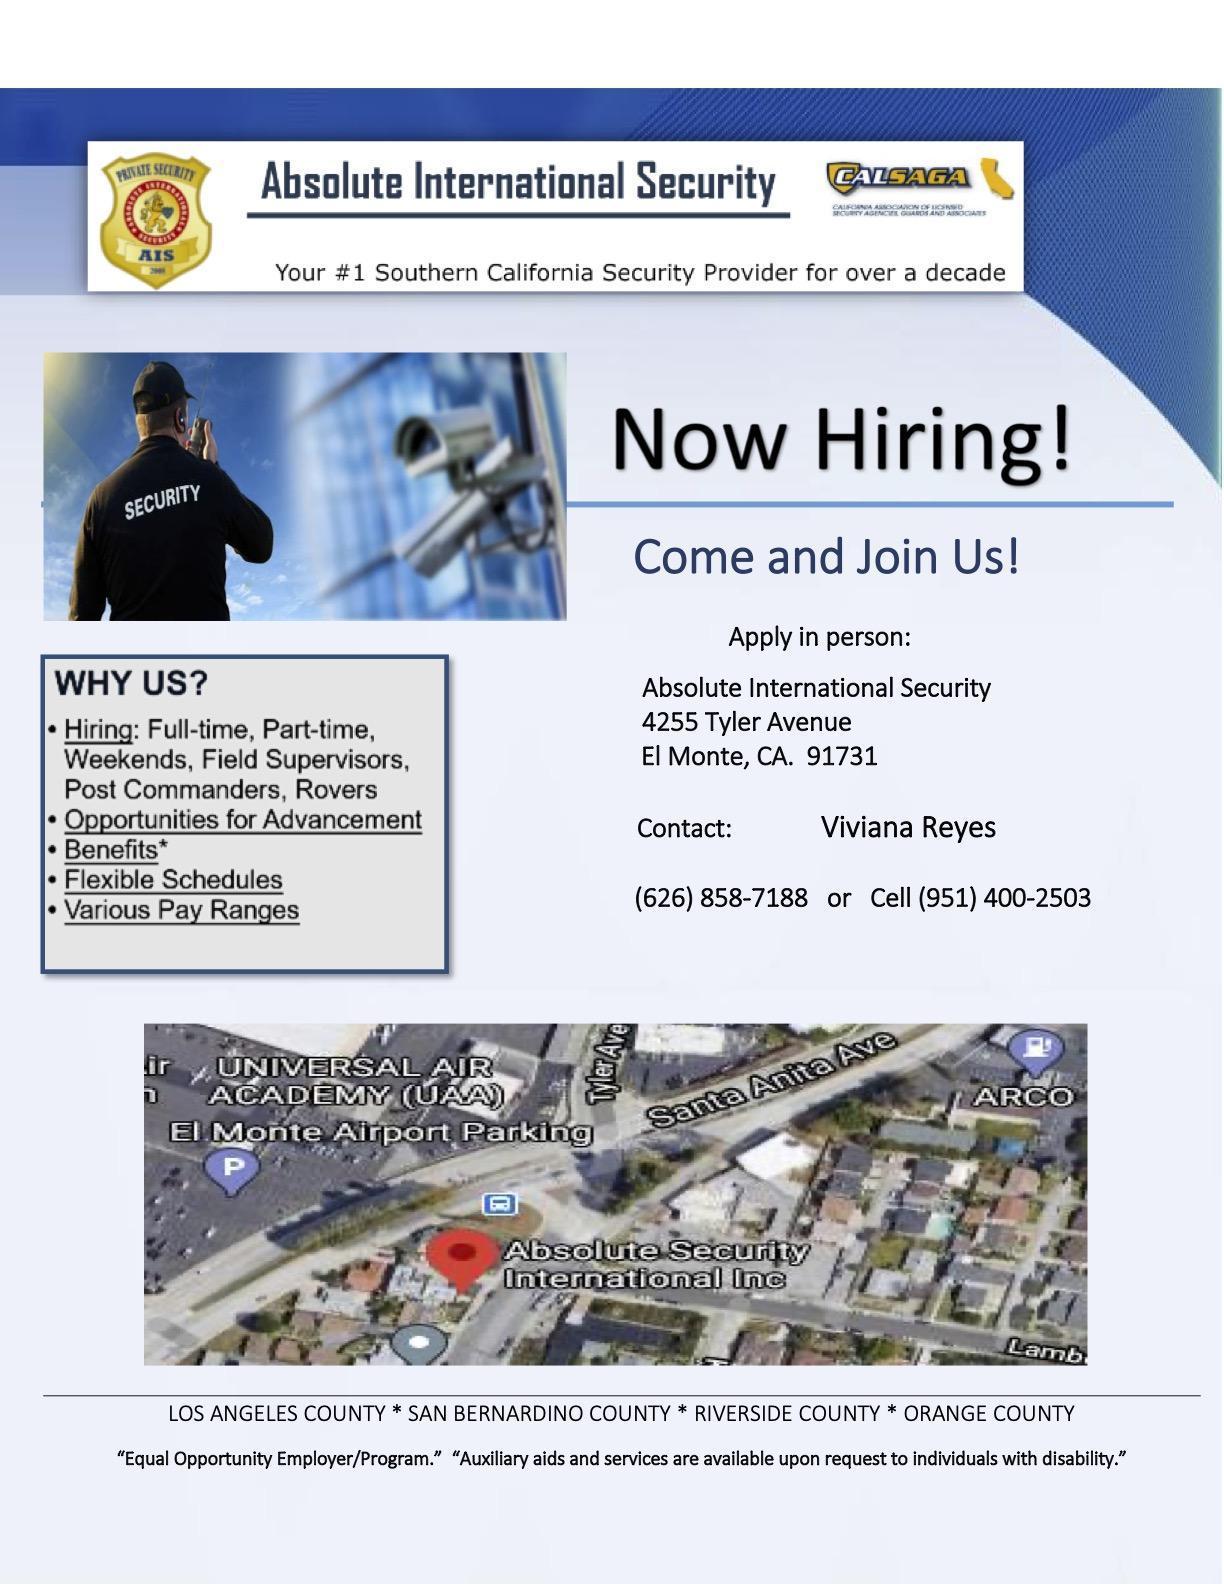 Absolute International Security job posting flyer